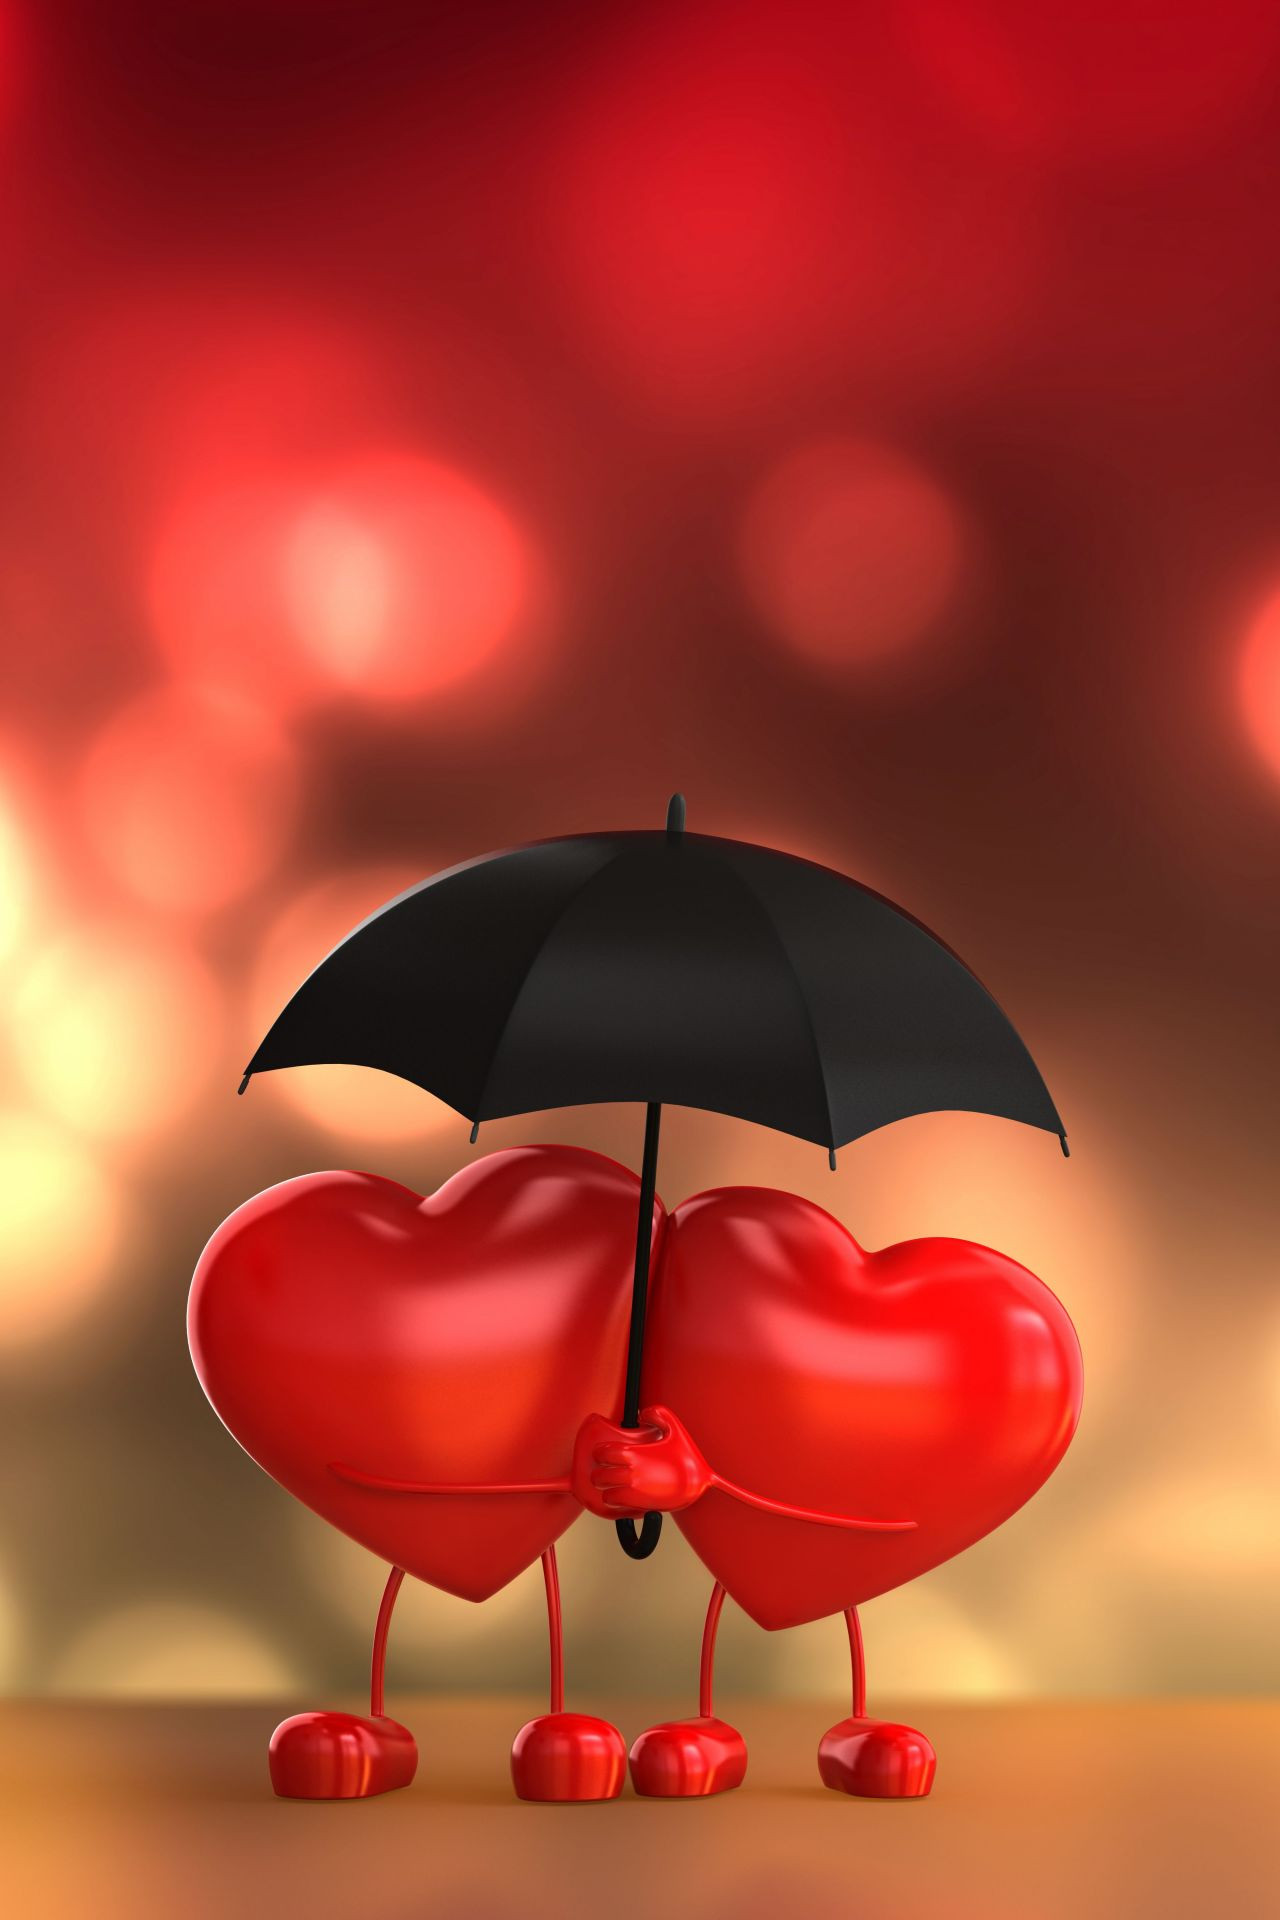 Sevgi temalı 20 harika duvar kağıdı! - Page 1